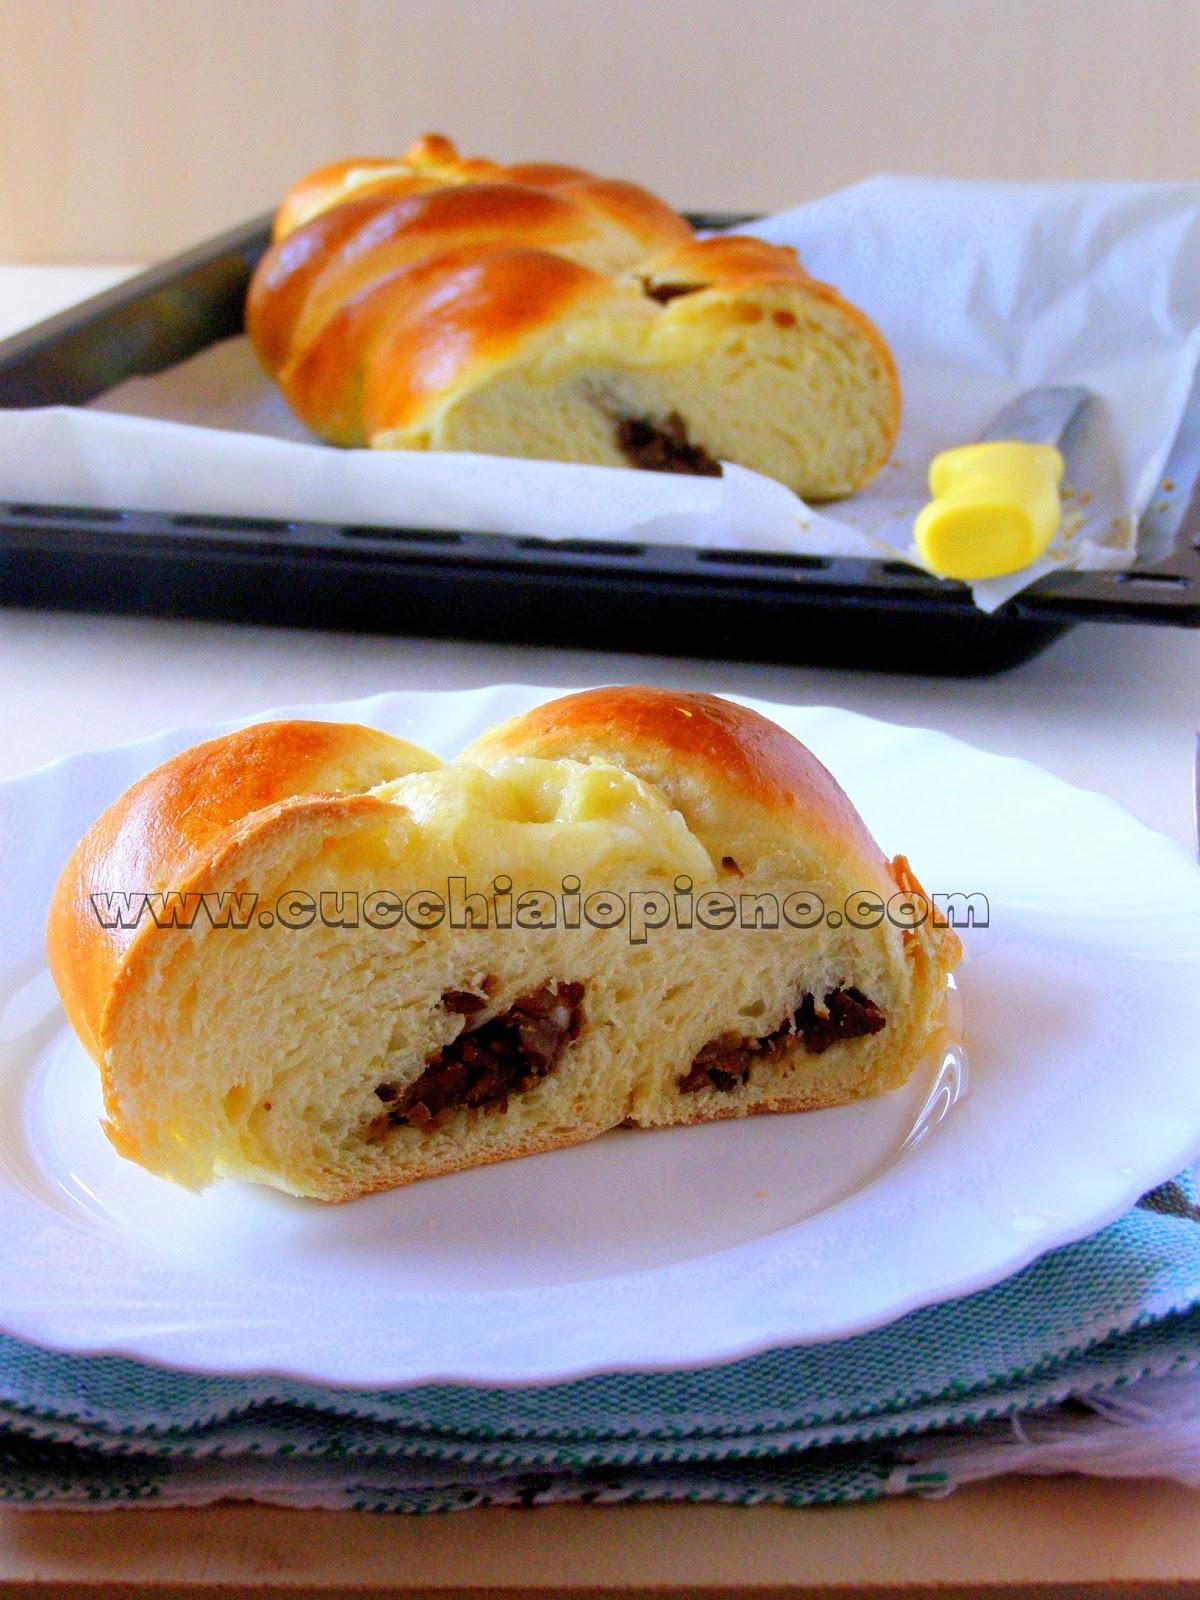 pão recheado delicioso